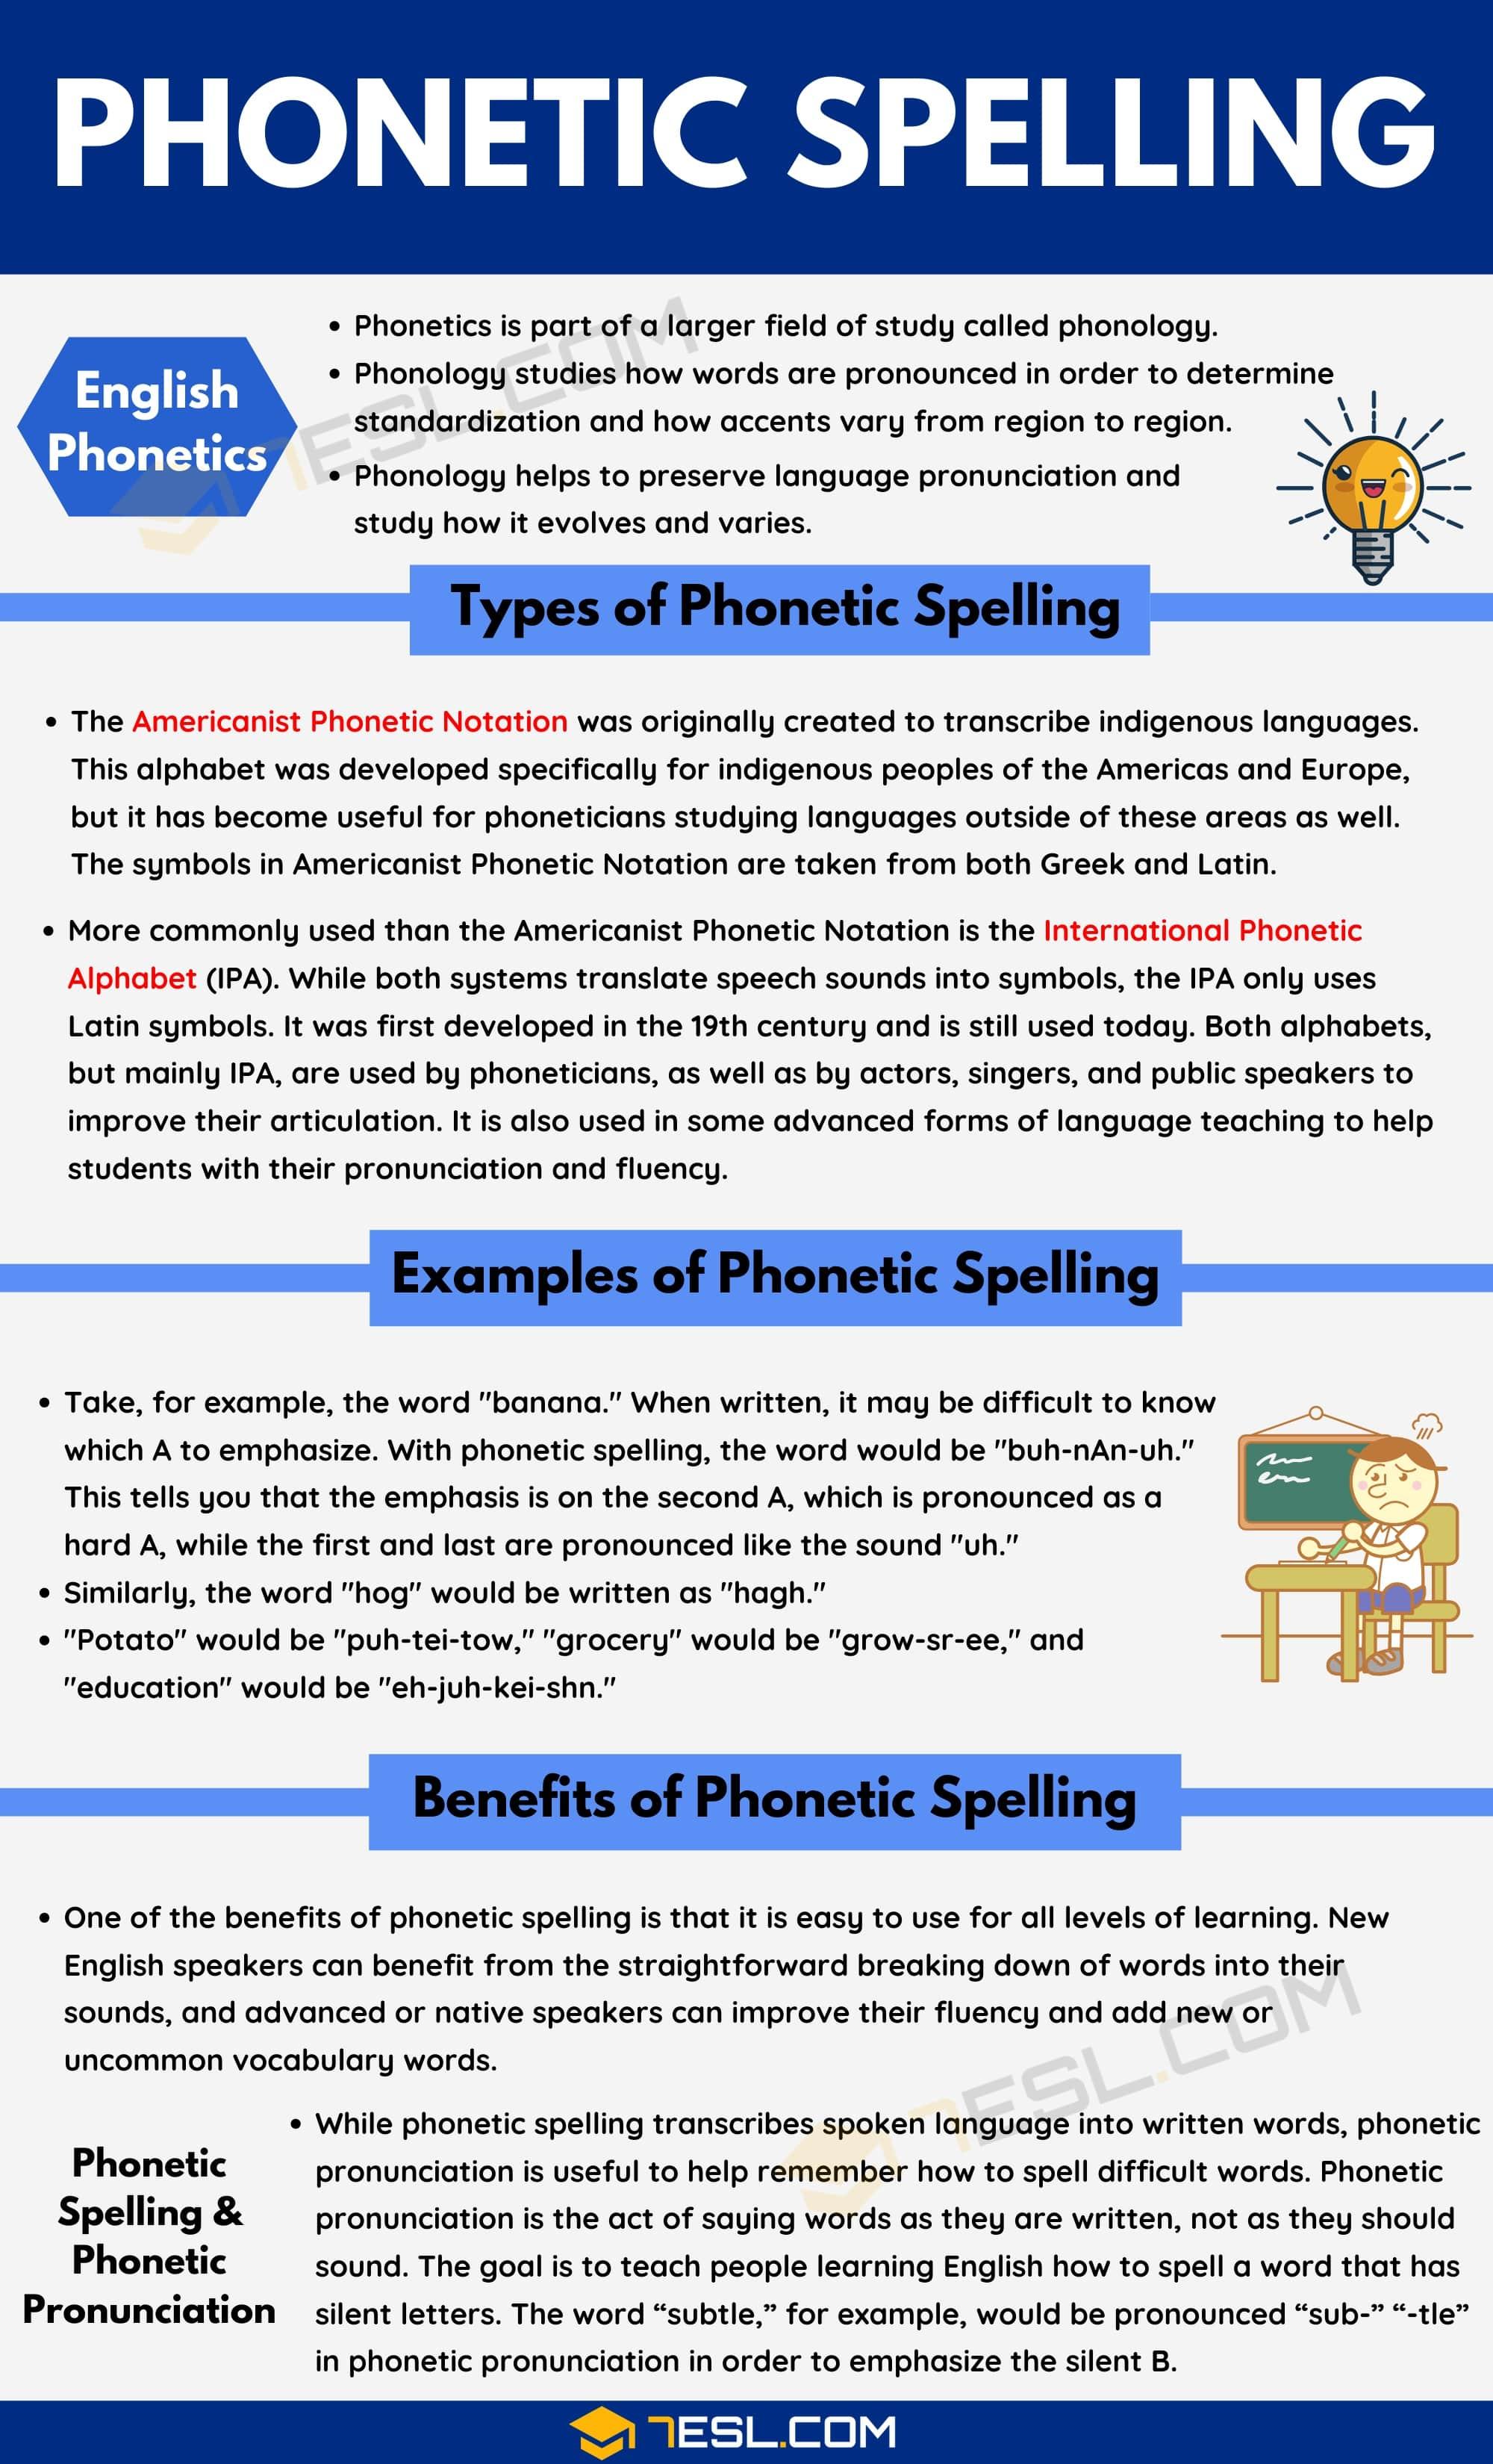 Phonetic Spelling